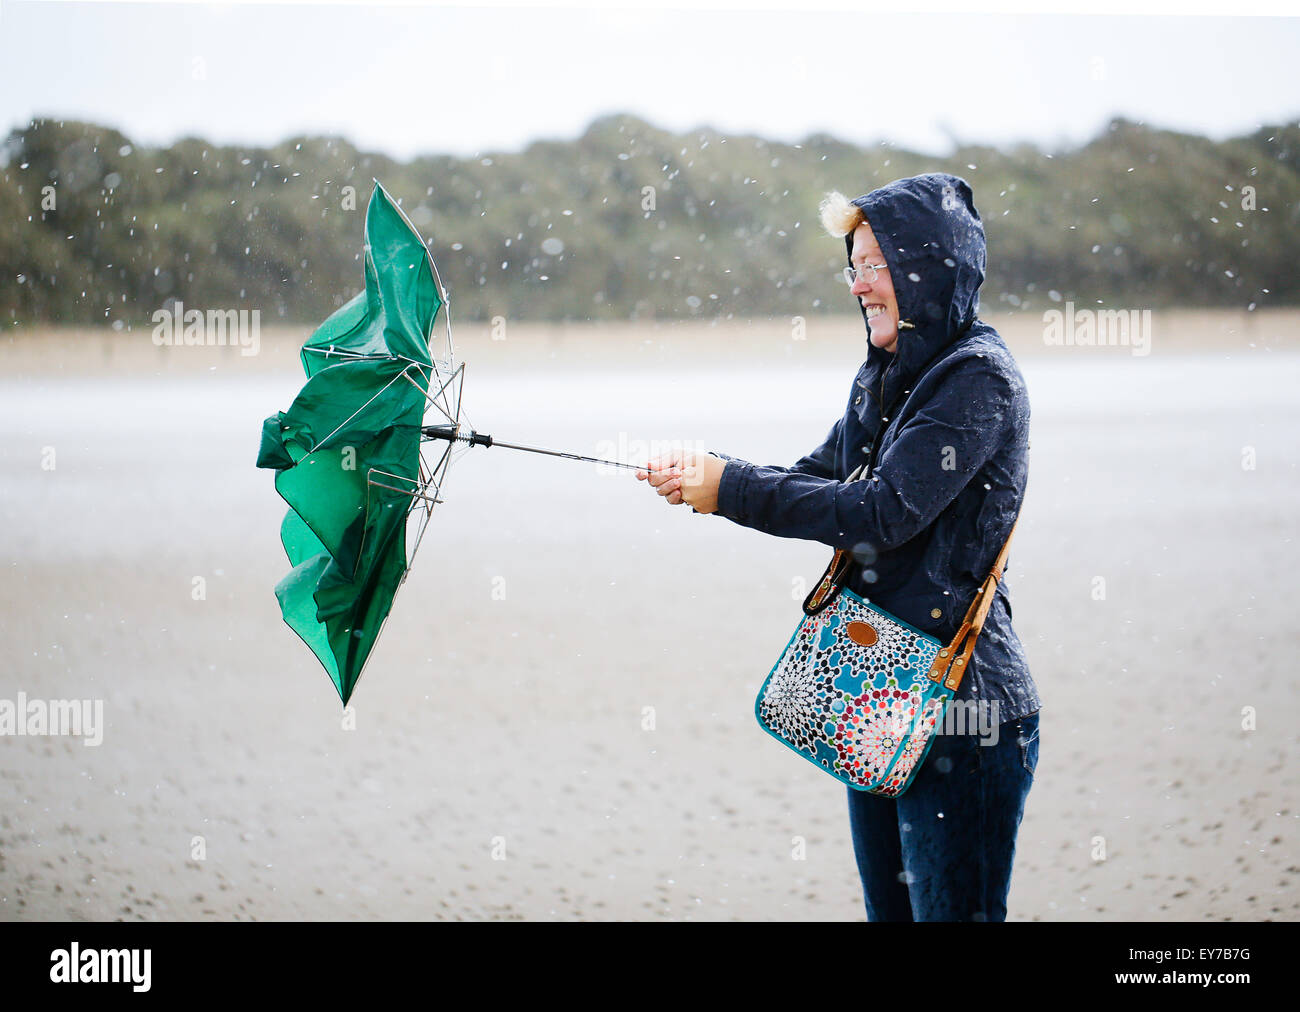 an-umbrella-blown-inside-out-during-a-st